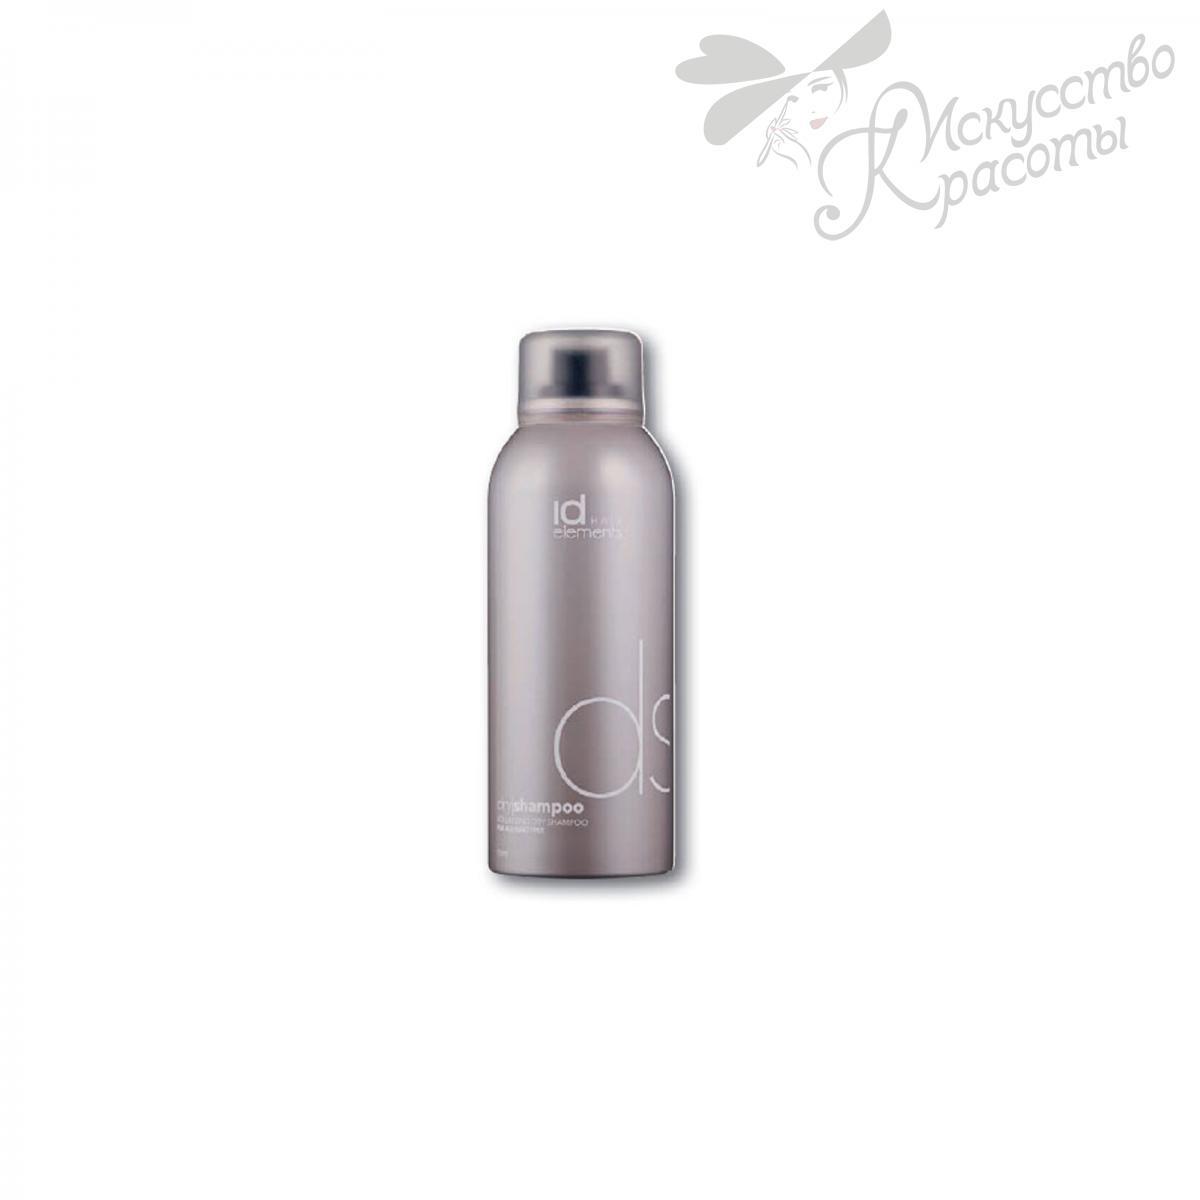 Сухой шампунь ID Hair Silver Volumizing Dry 150 мл